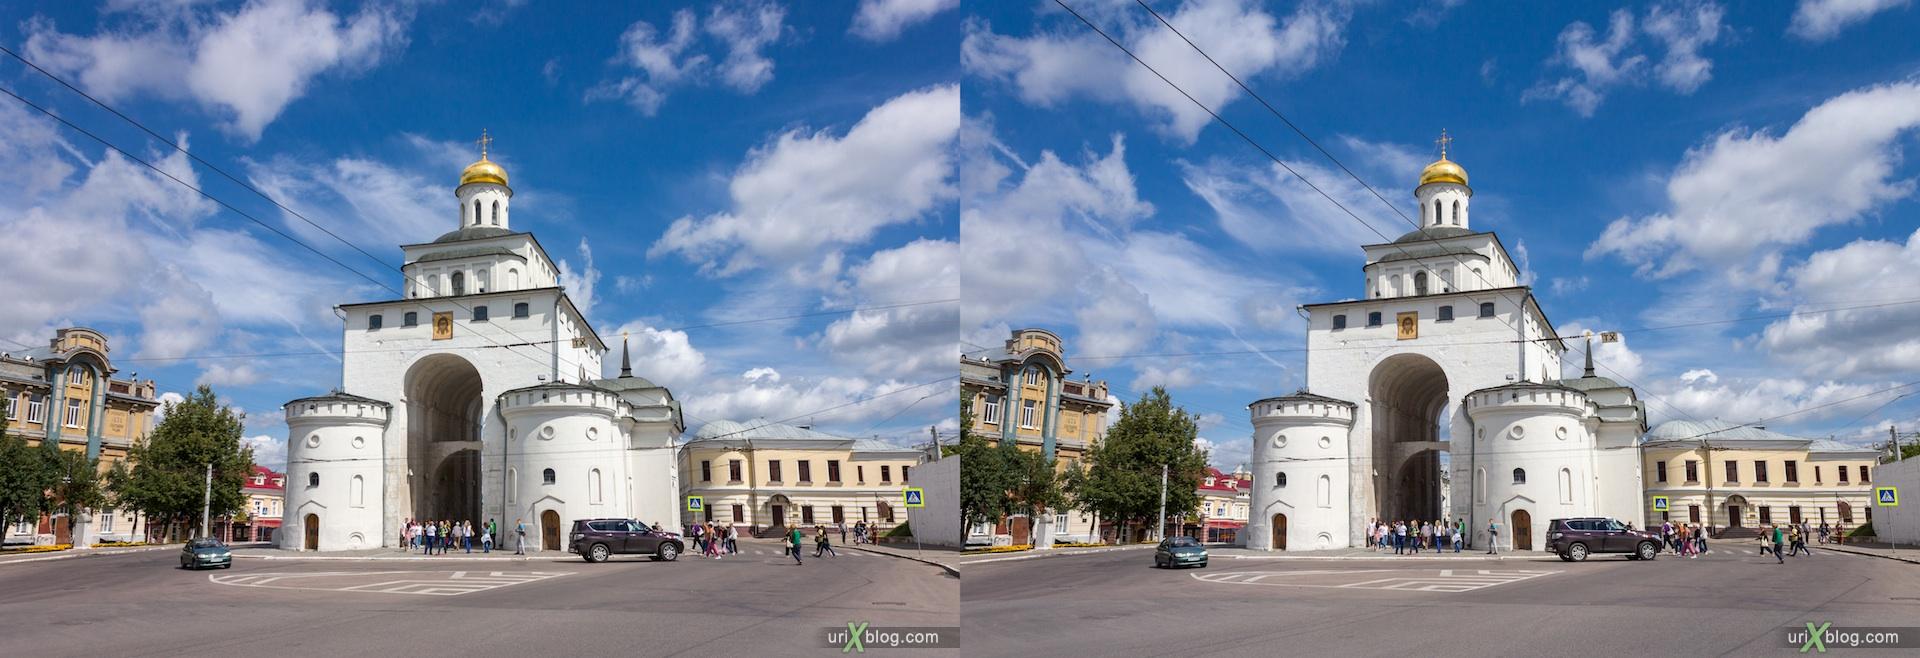 2012 3D stereo stereo pair 3Д стерео церковь храм монастырь владимир Золотые ворота, Church Vladimir